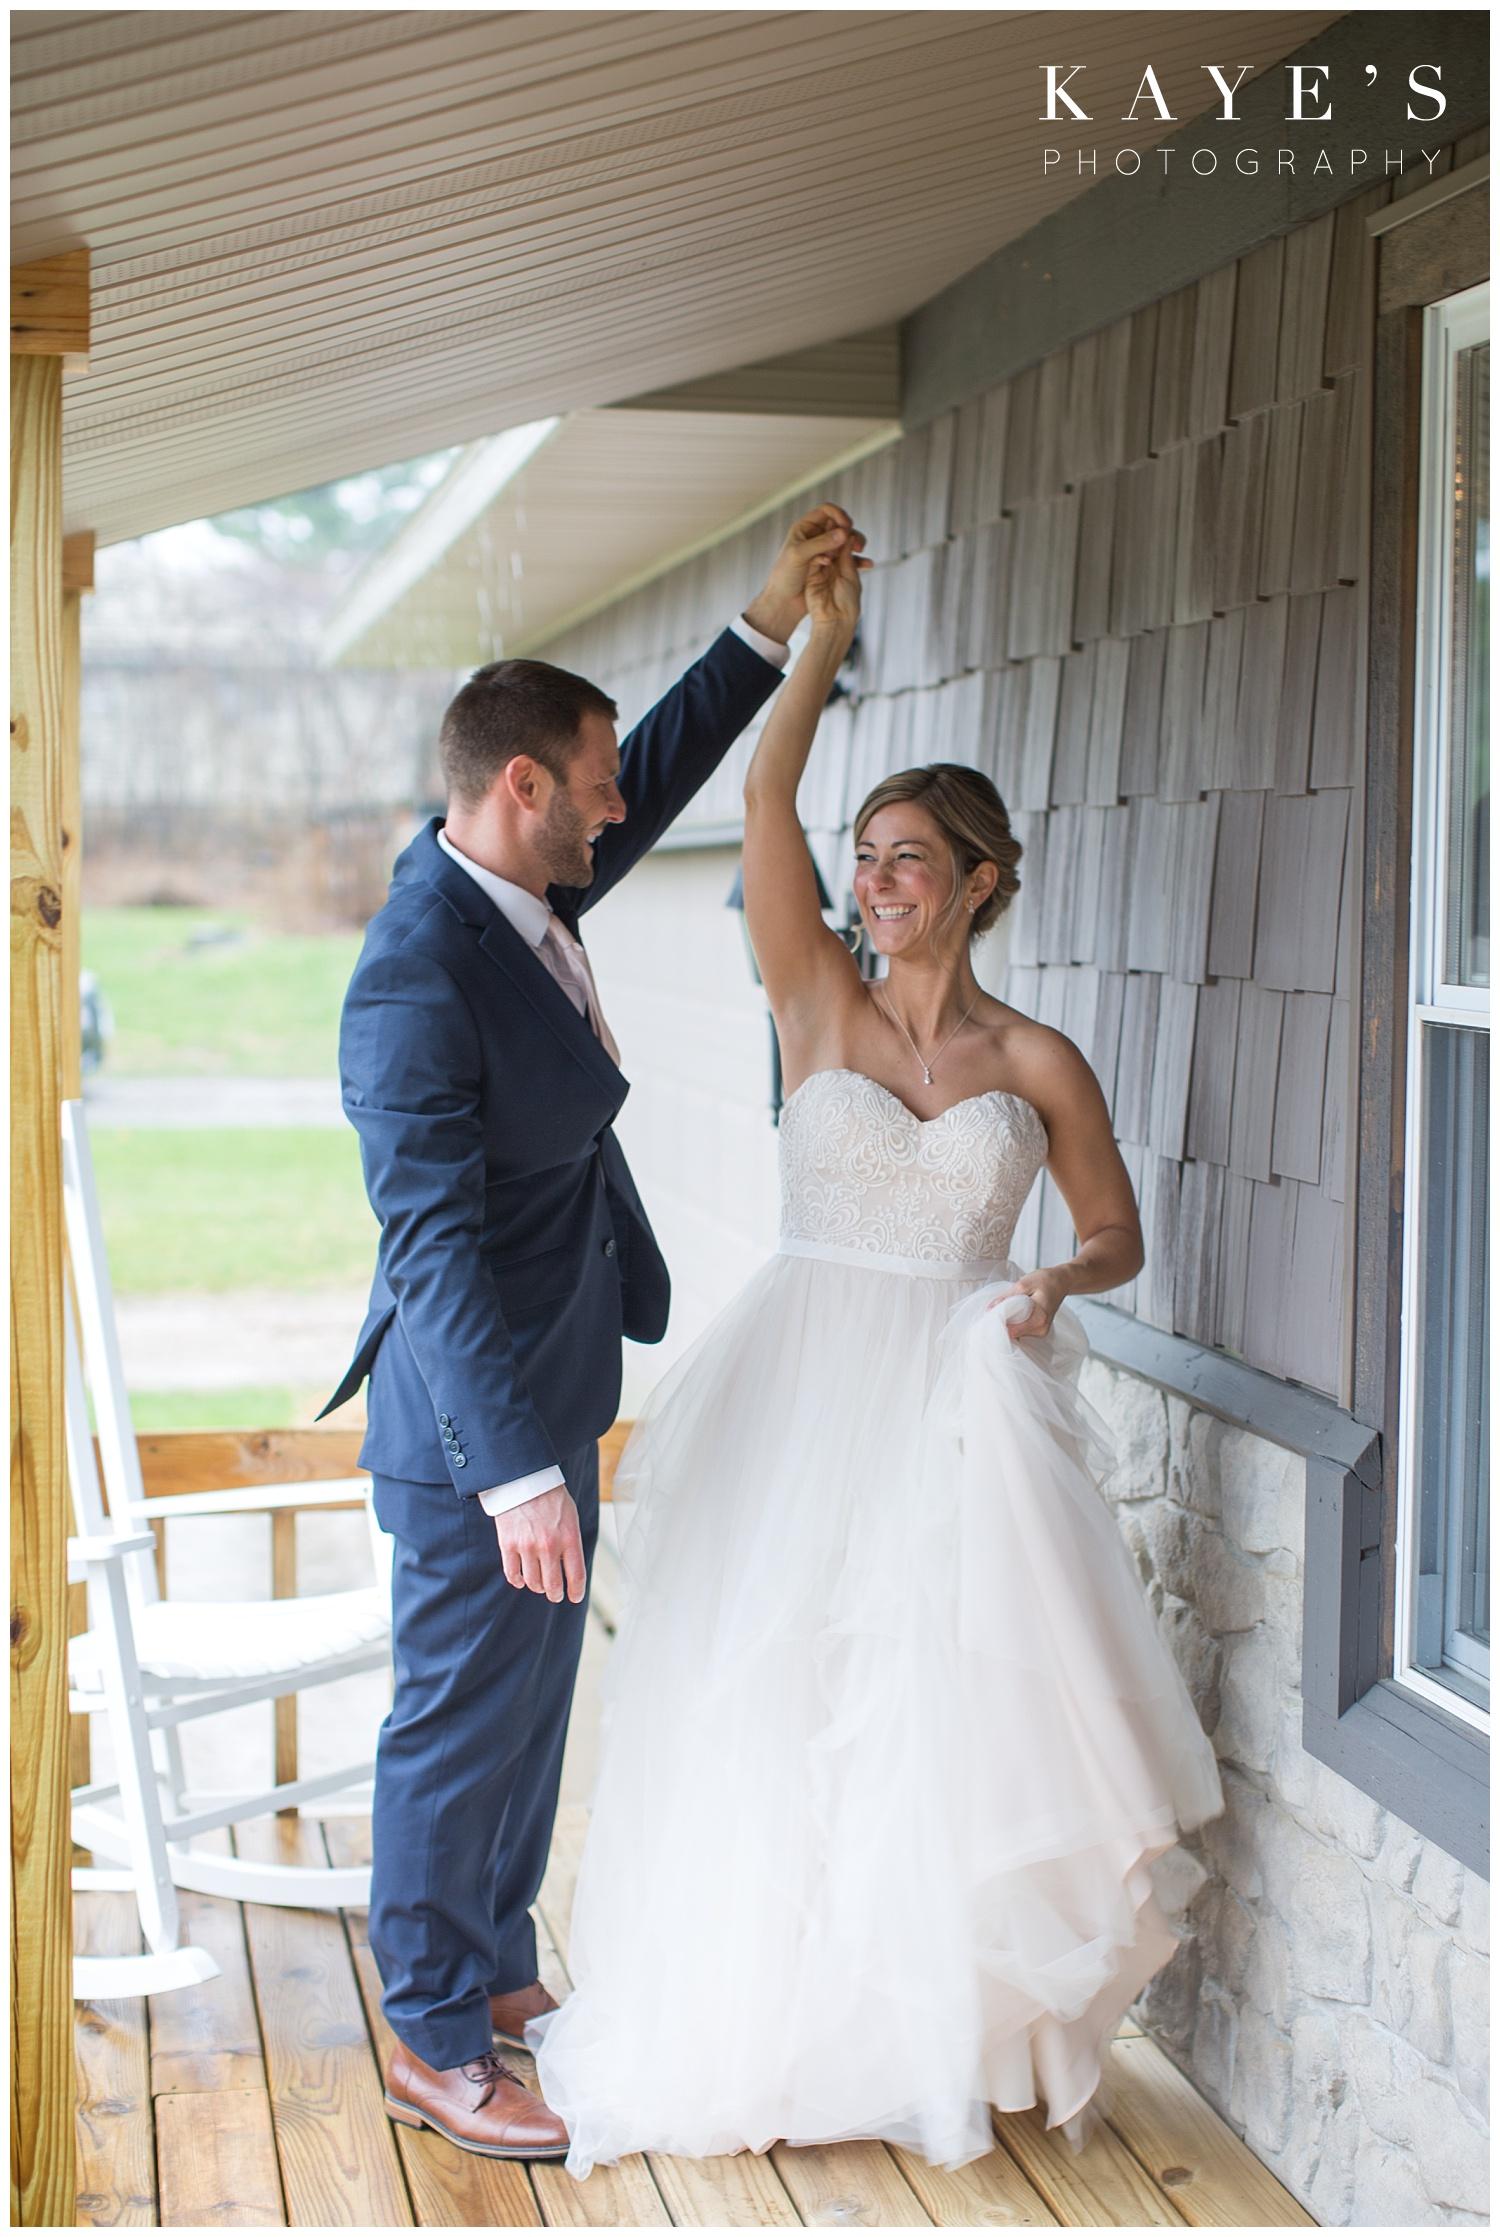 Backyard-intimate-grand-blanc-wedding-Michigan-photographer_0014.jpg